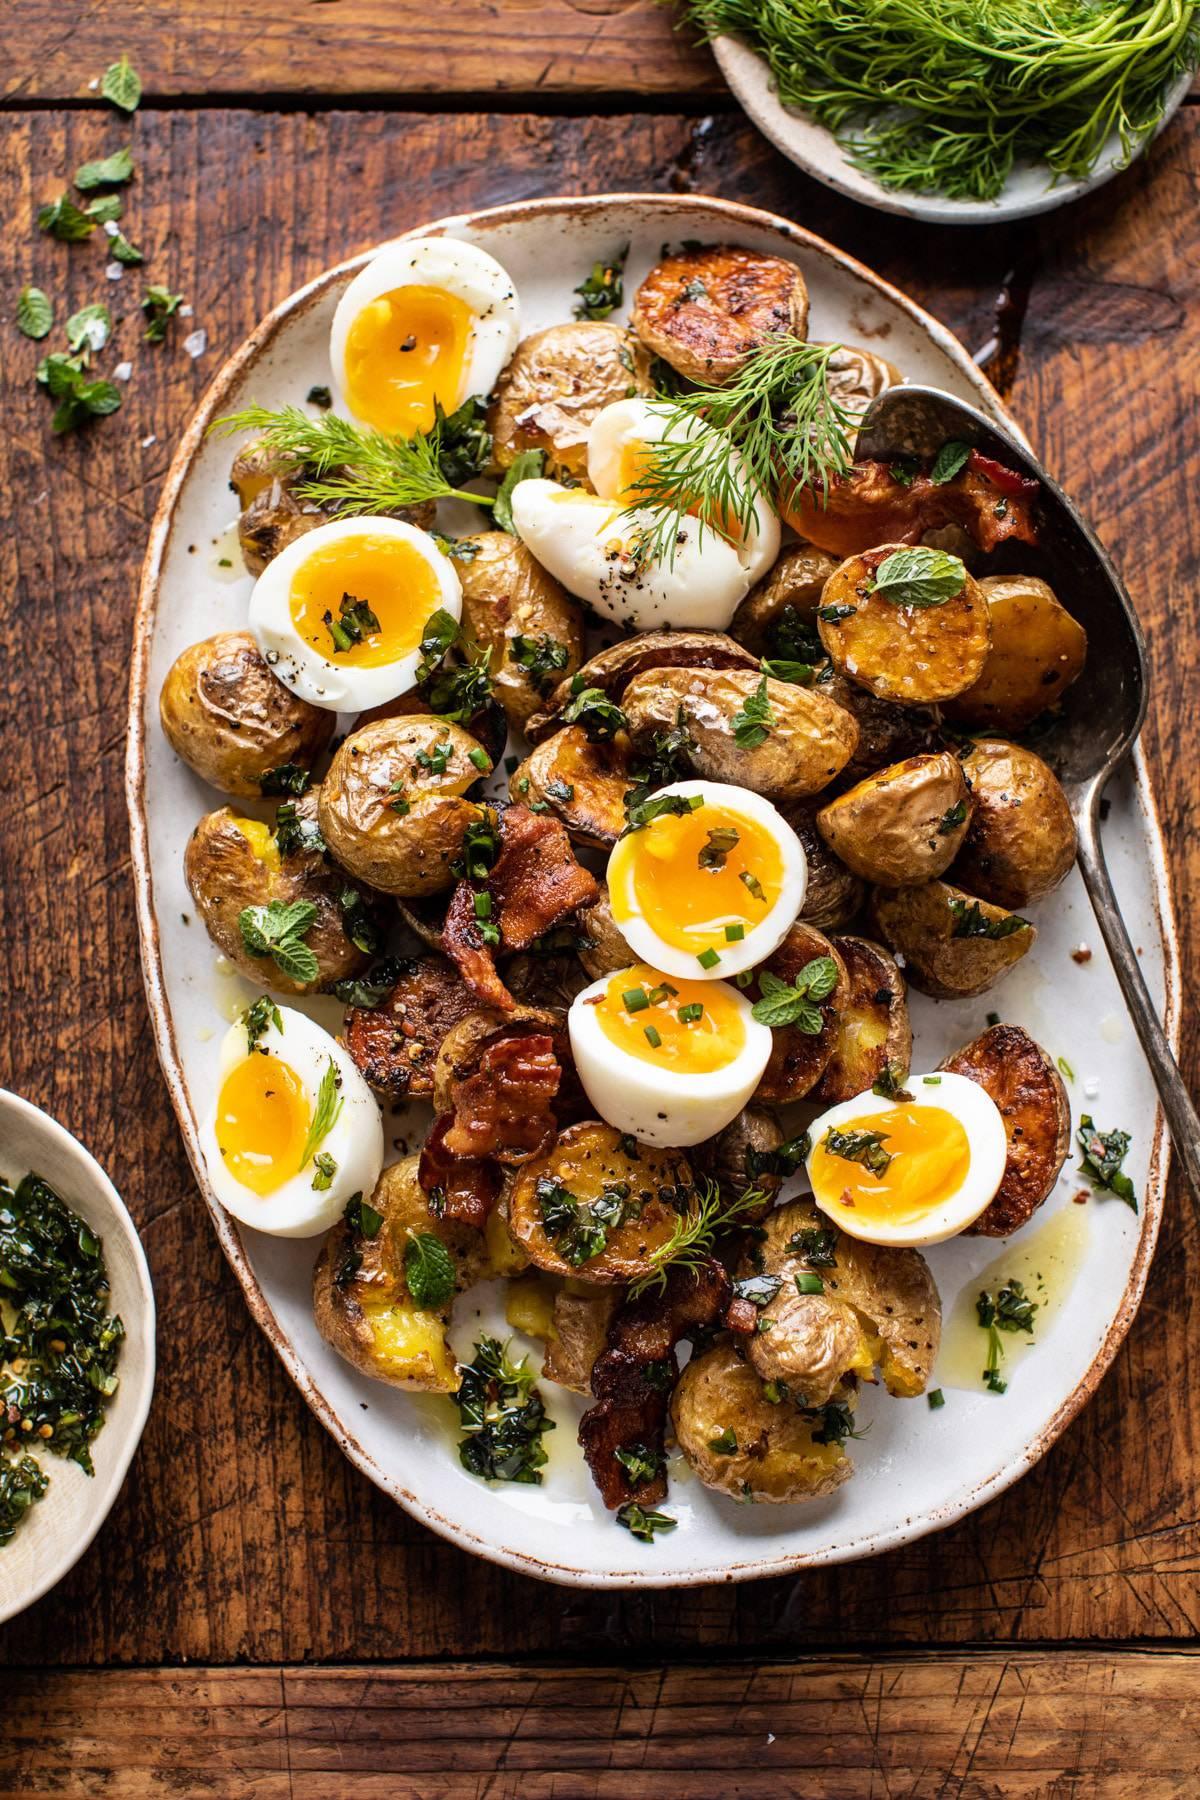 Crispy Breakfast Potatoes with Chili Garlic Oil and Herbs